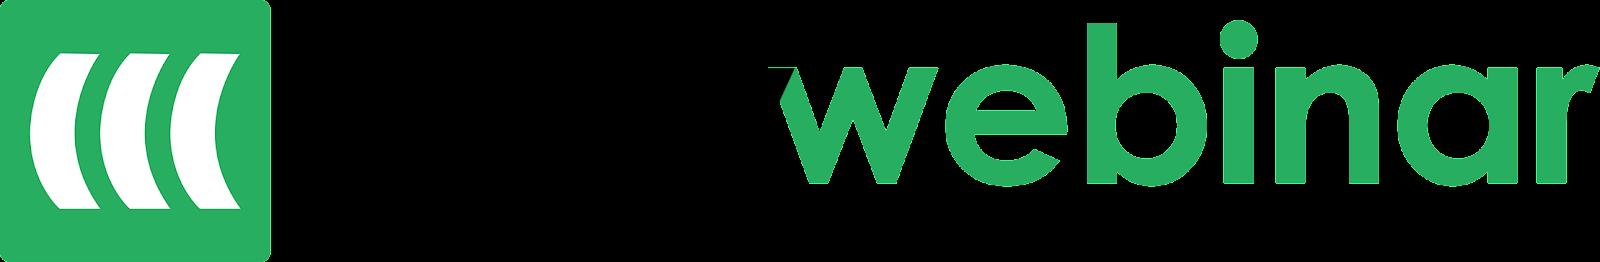 EasyWebinar logo webinar tool